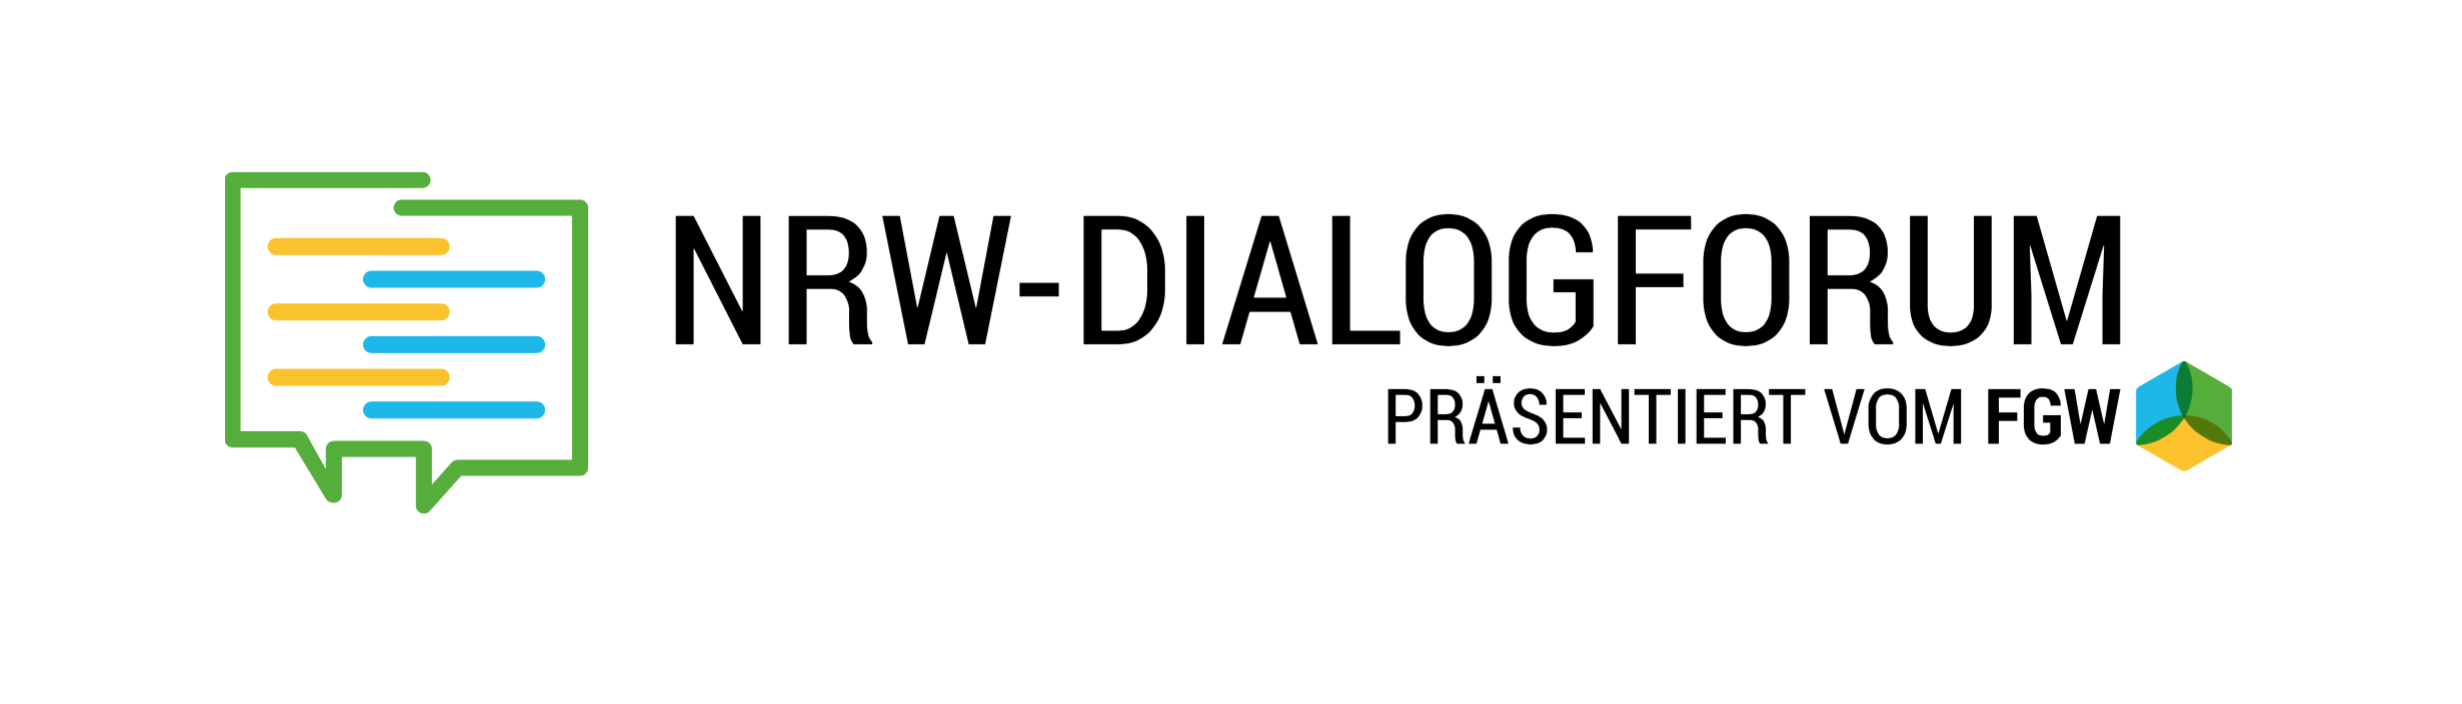 NRW-Dialogforum vom FGW